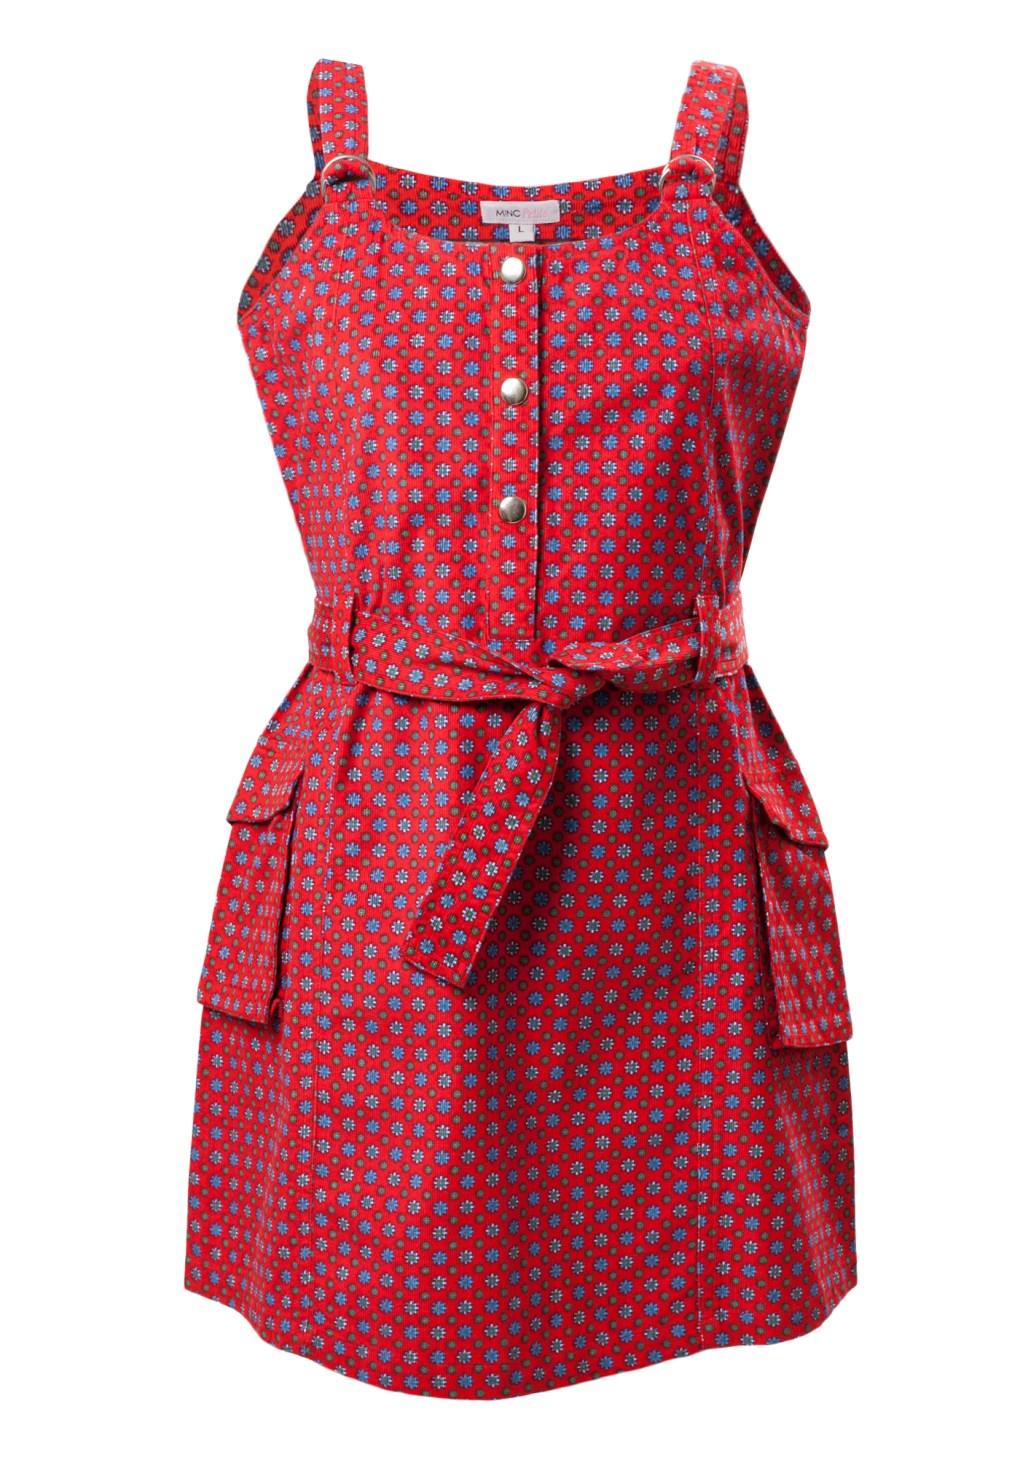 MINC Petite Fiery Flowery Spring Girls Short Dress in Printed Cotton